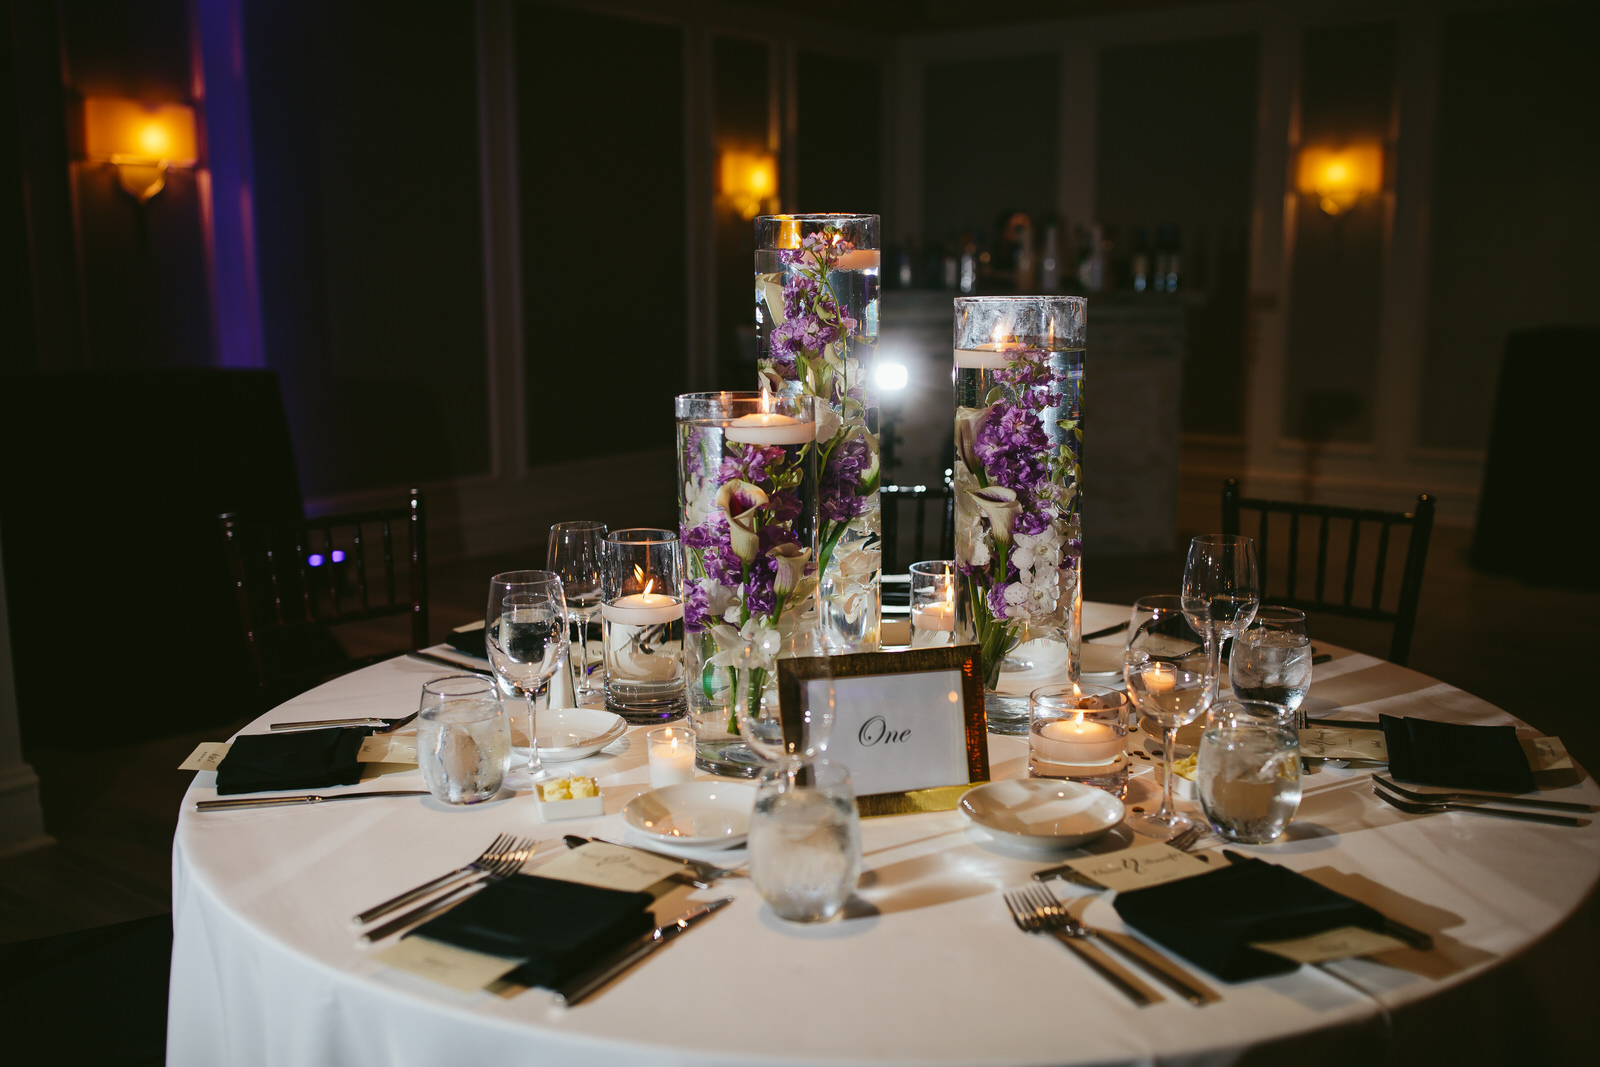 wedding_details_tiny_house_photo_best_weddings_photographer_luxury_celebrity.jpg